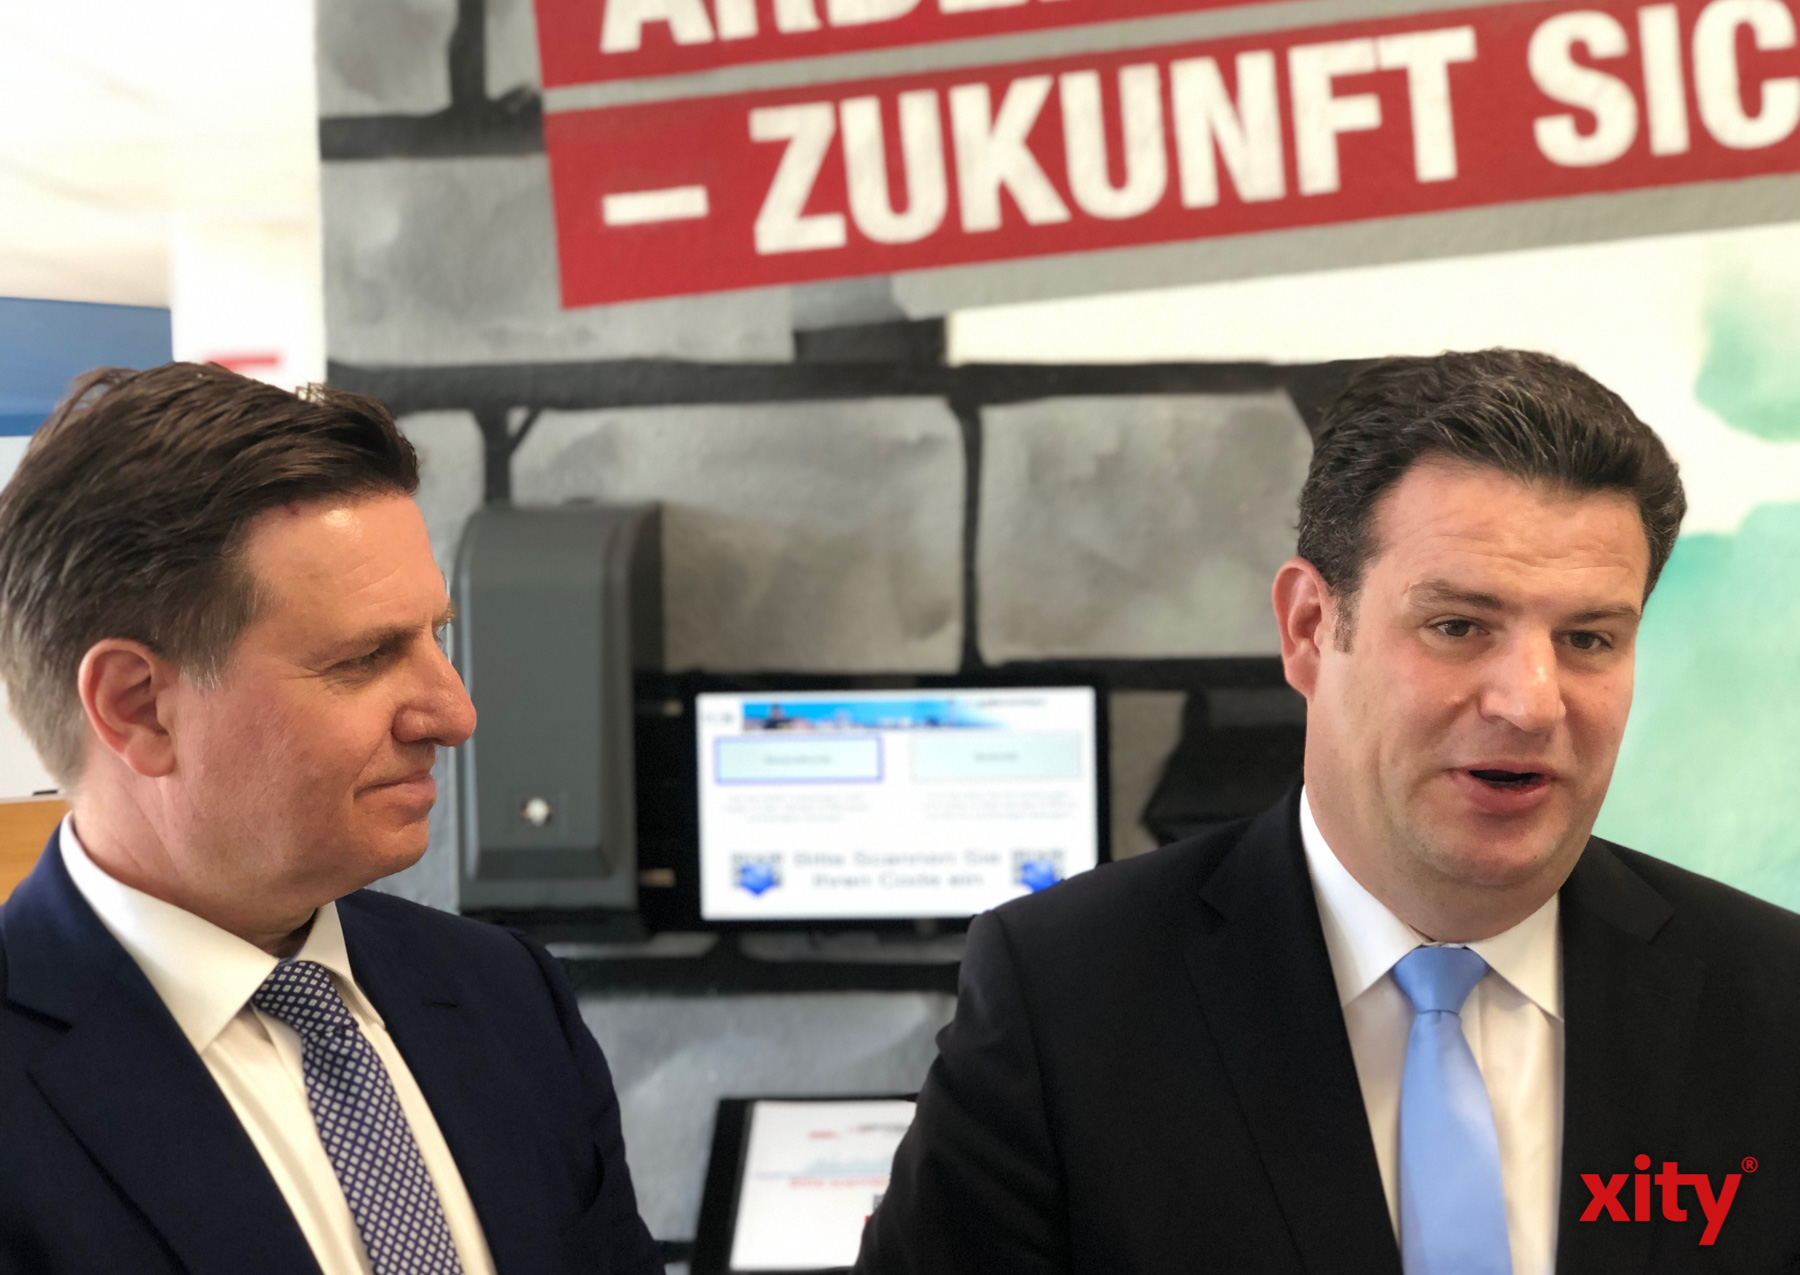 Minister Hubertus Heil lobte die Arbeit des Düsseldorfer Jobcenters (Foto: xity)